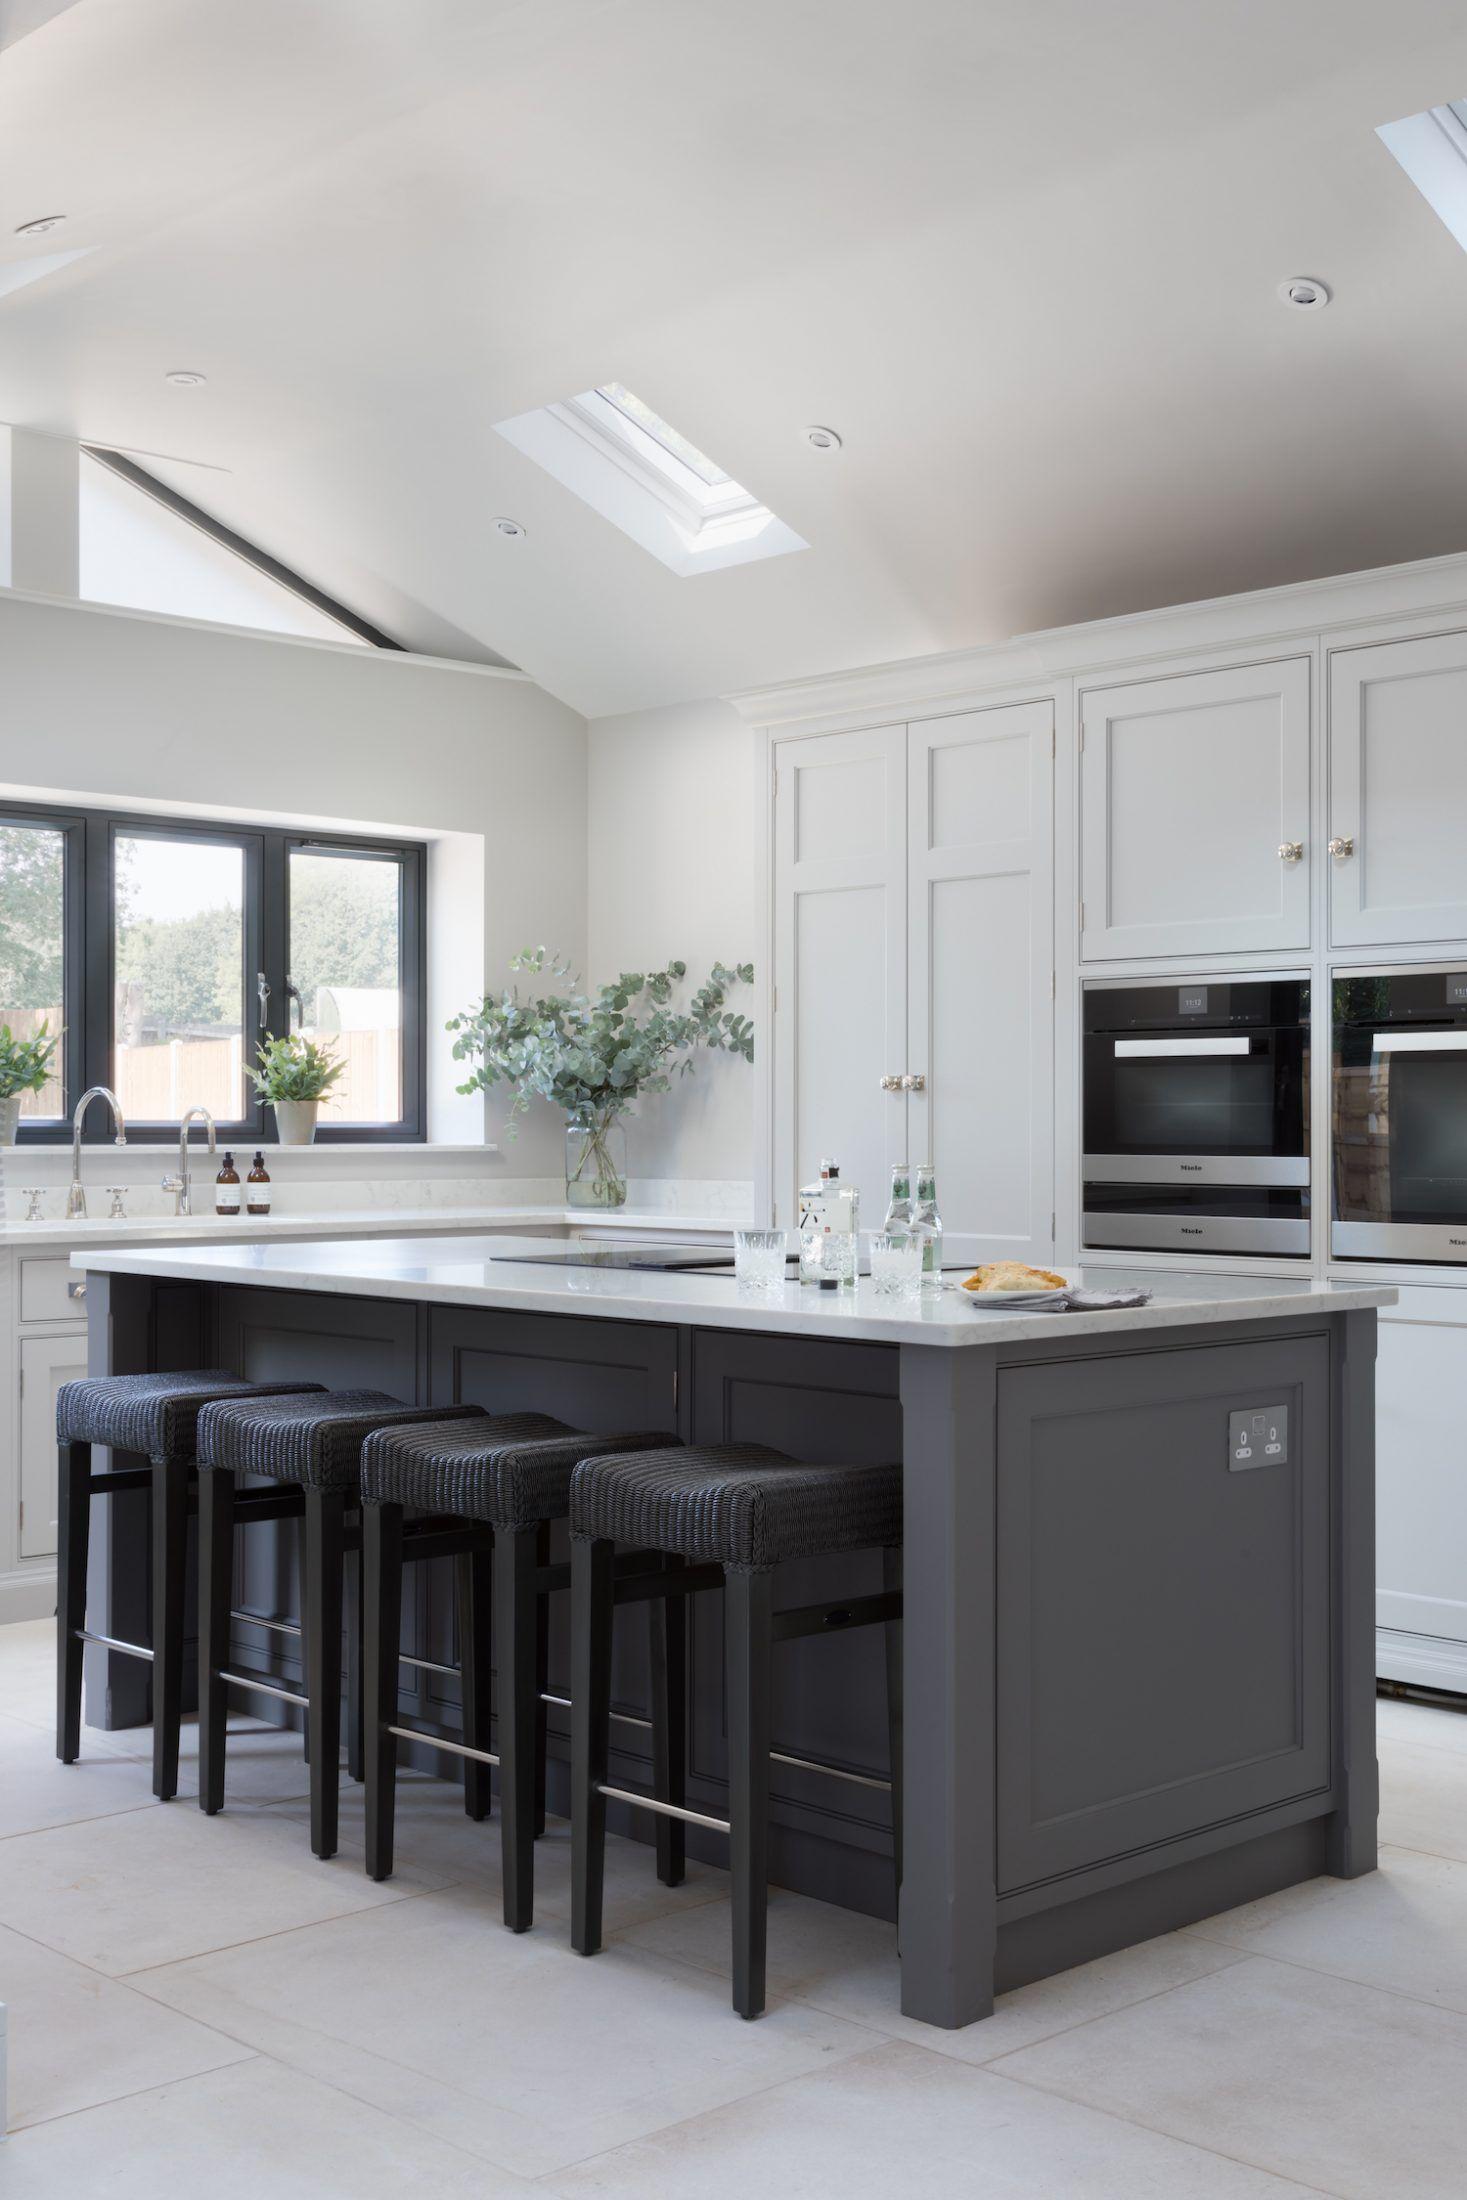 Classic Contemporary Kitchen, Ingatestone, Essex